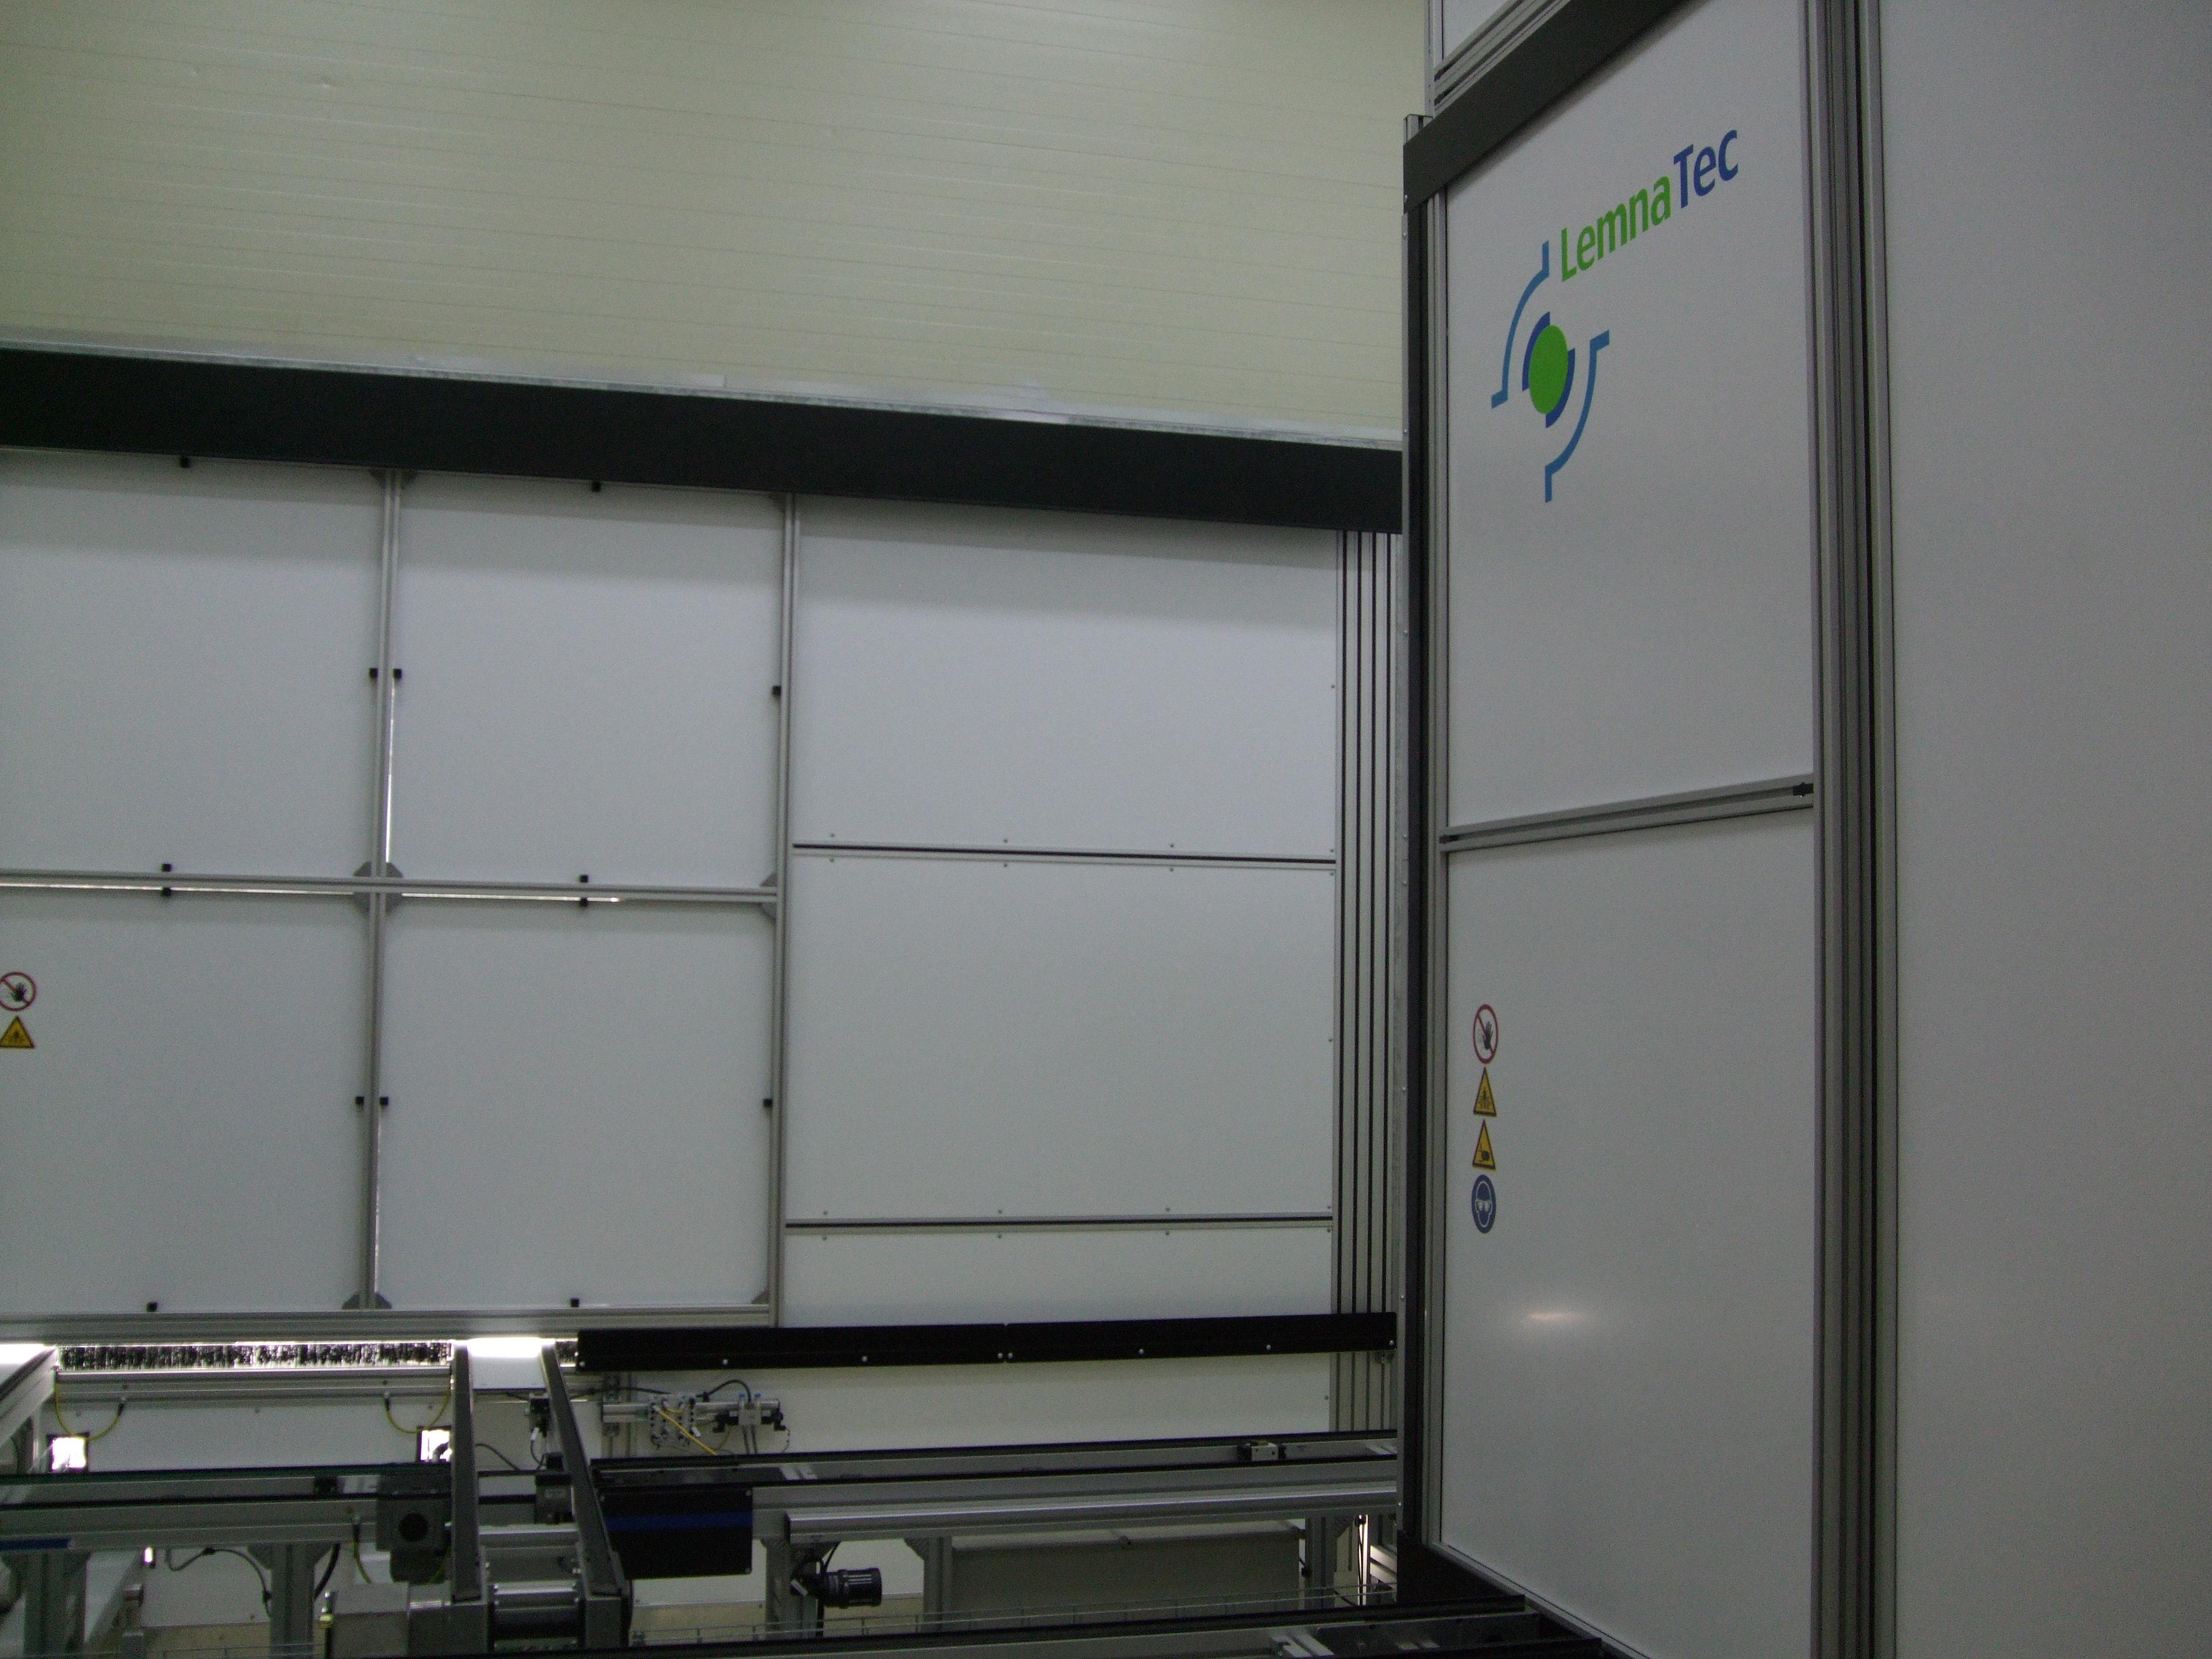 LemnaTec Conveyor Scanalyzer at NAAS, Jeonju, Korea